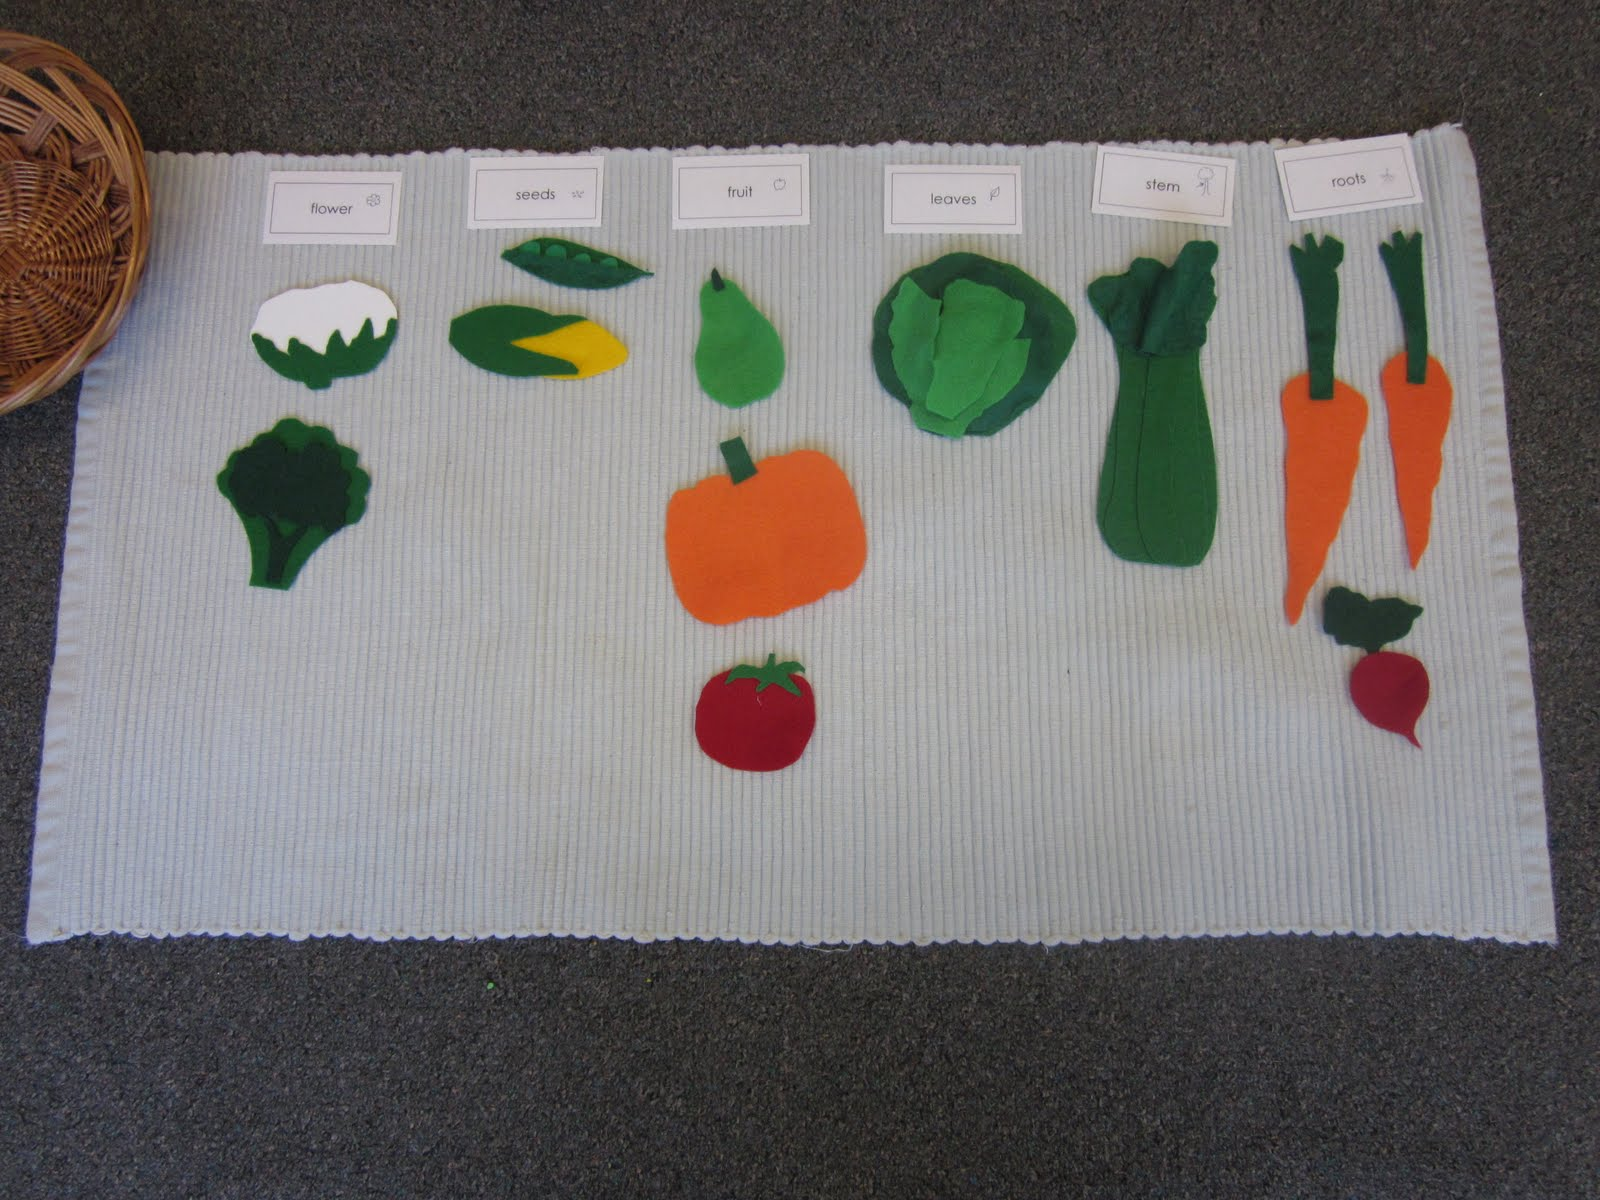 Sooke Montessori Seeds Fruit Leaves Roots Flowers Or Stem